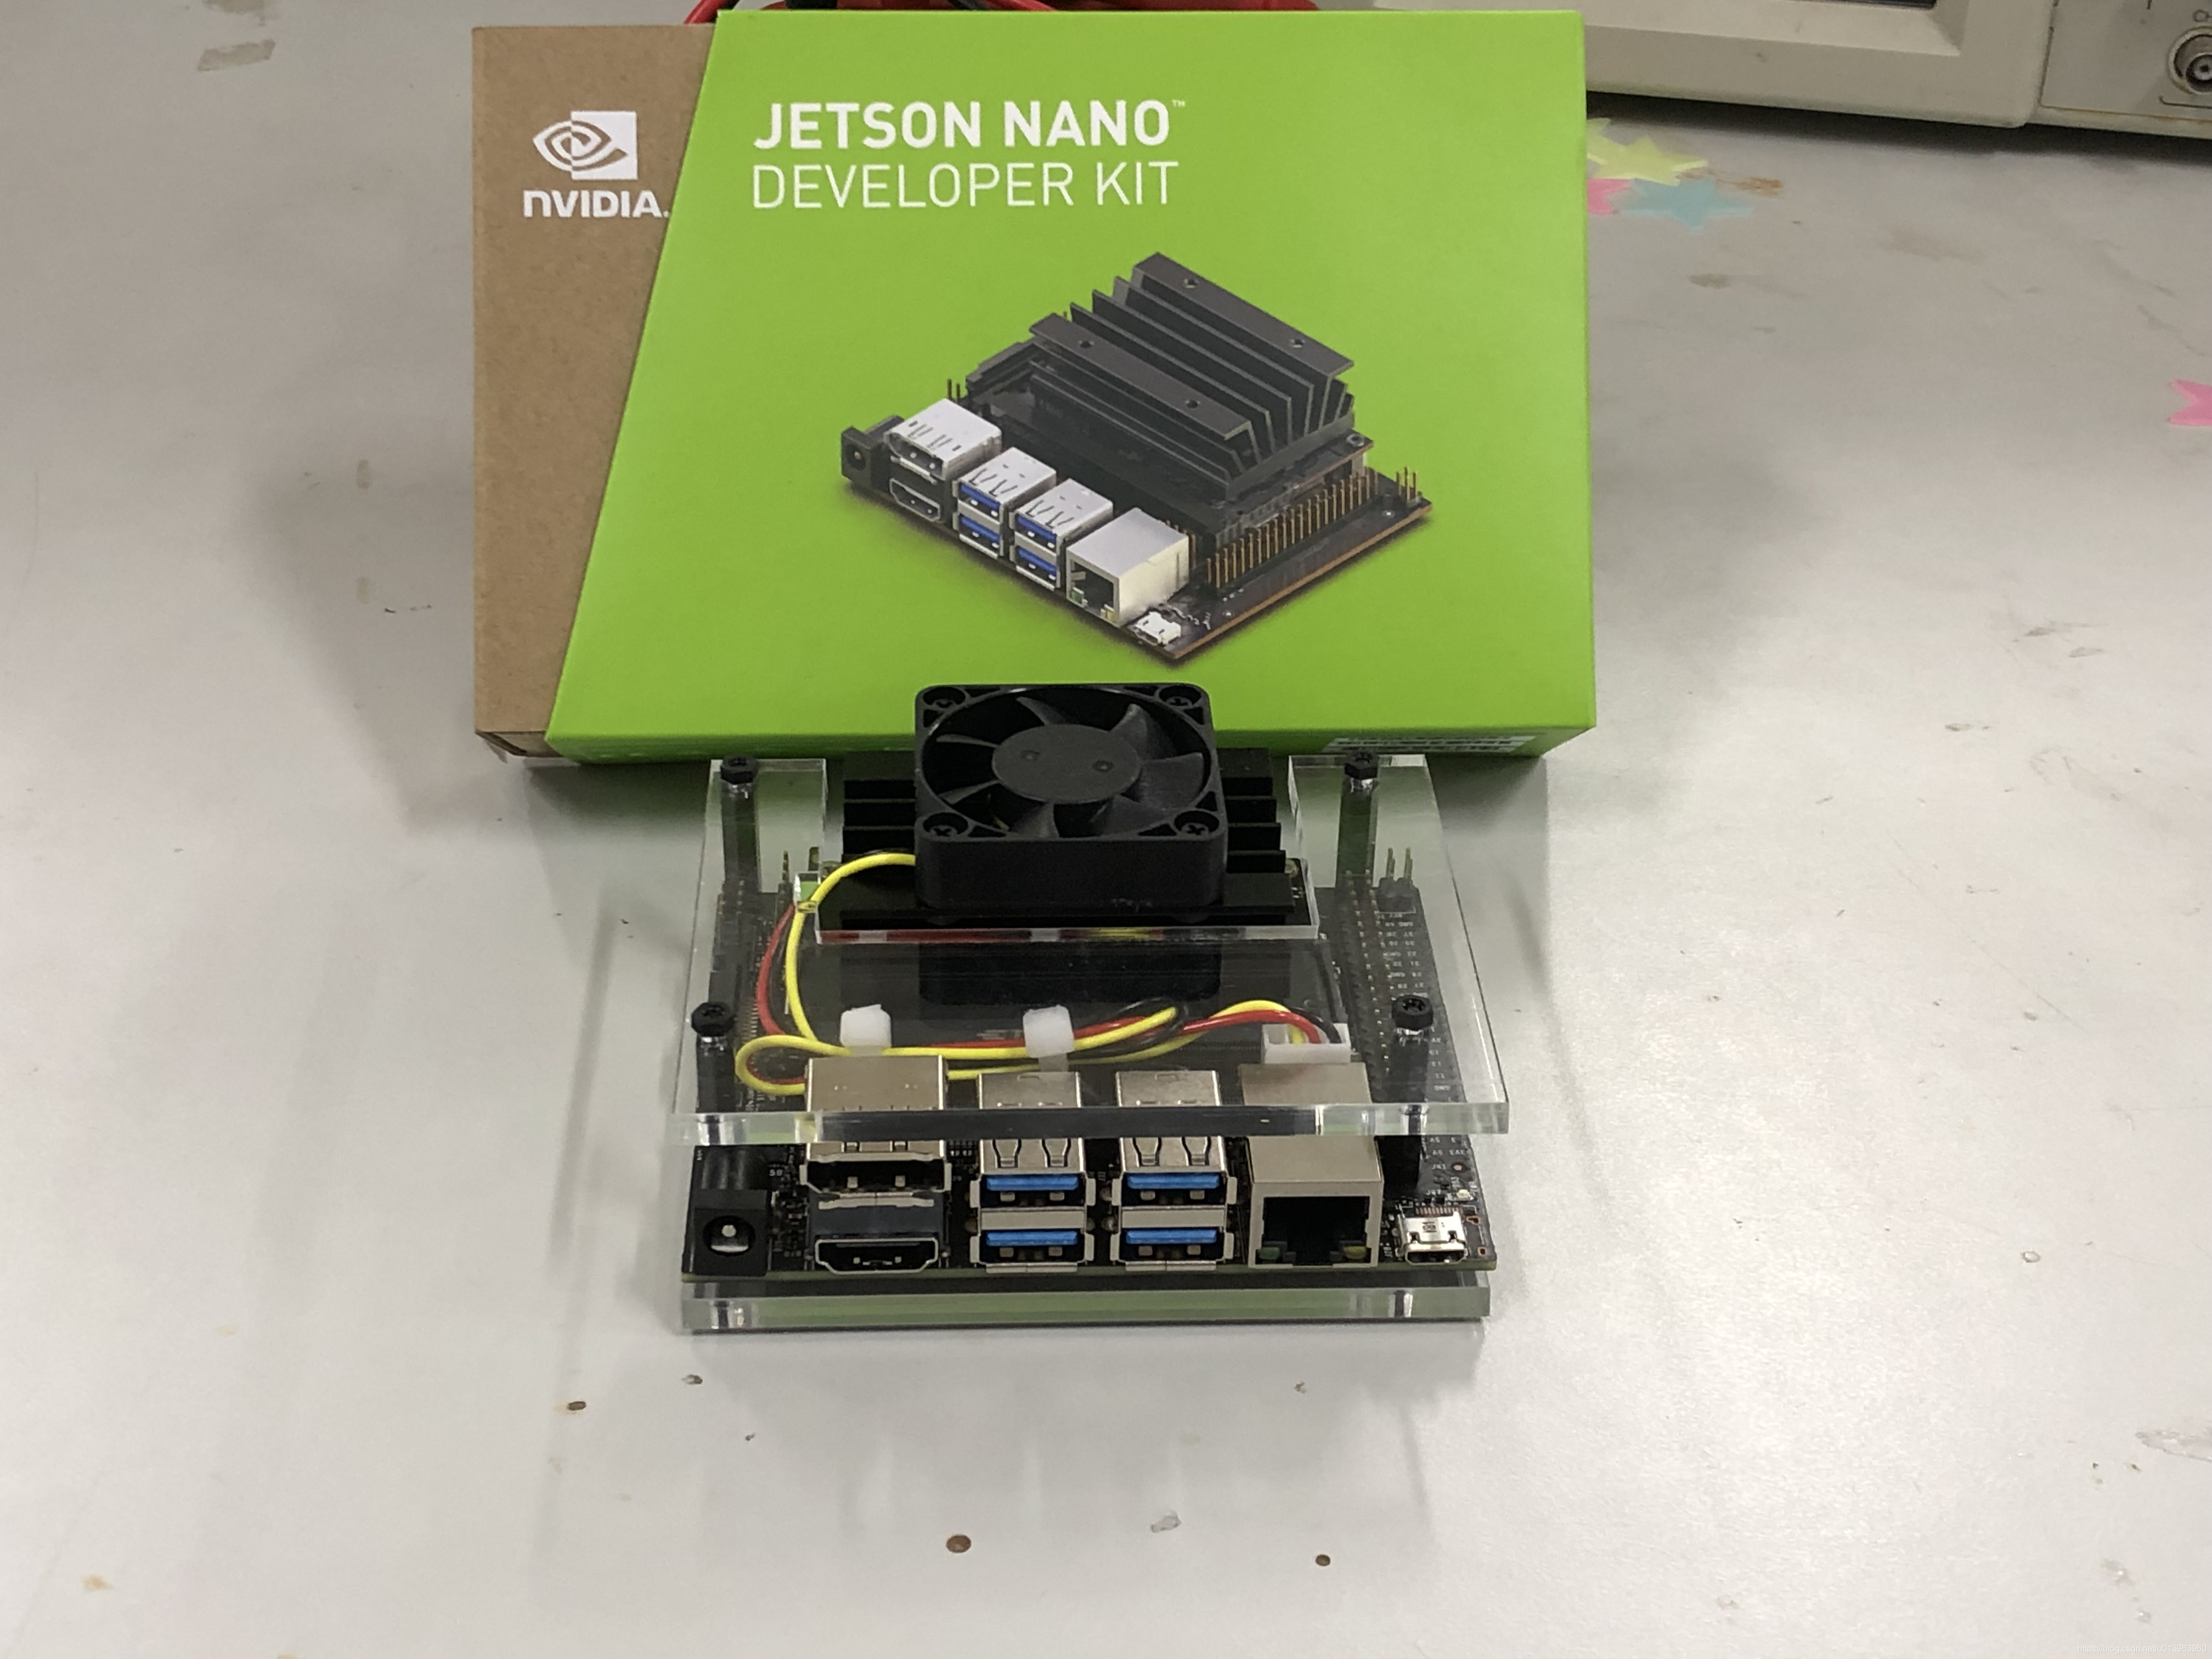 Jetson Nano刷机教程- 王向阳的博客- CSDN博客